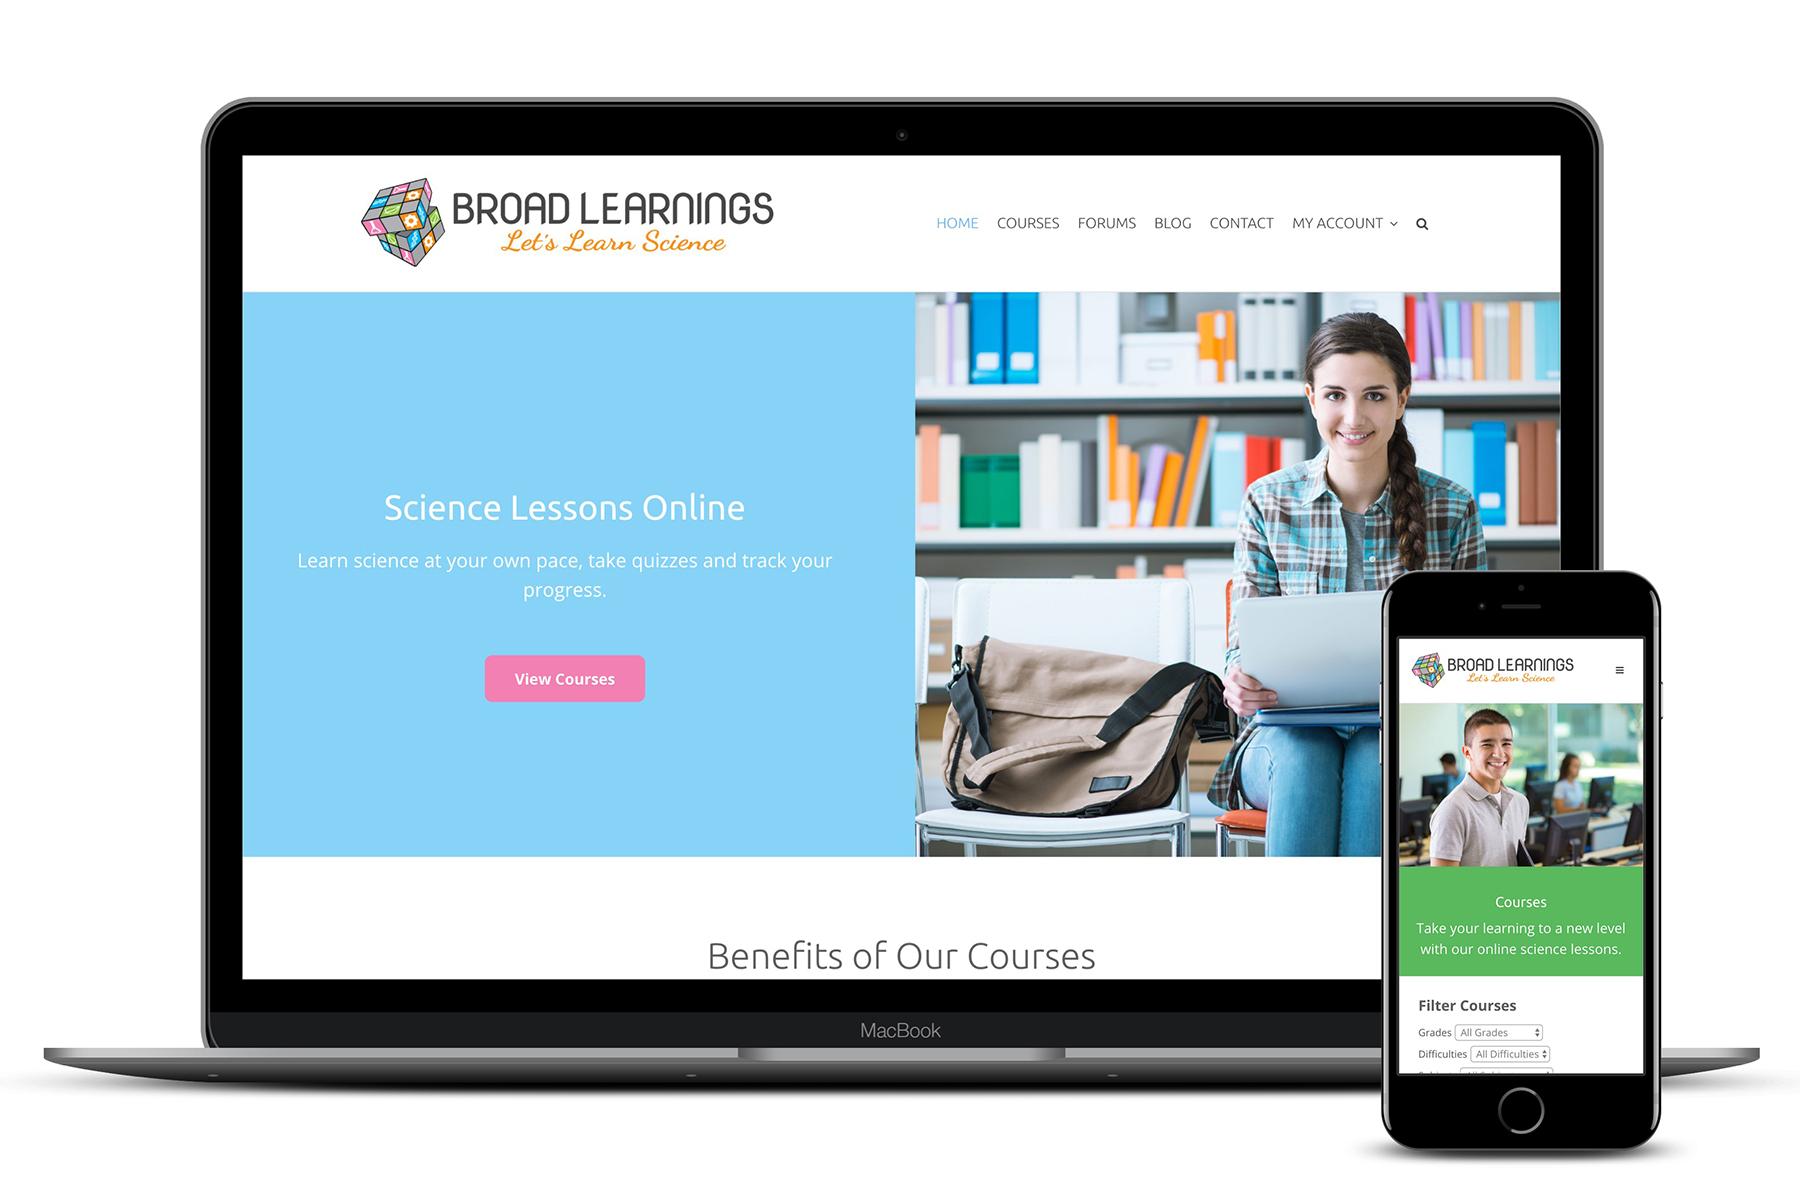 Broad Learnings Website Design